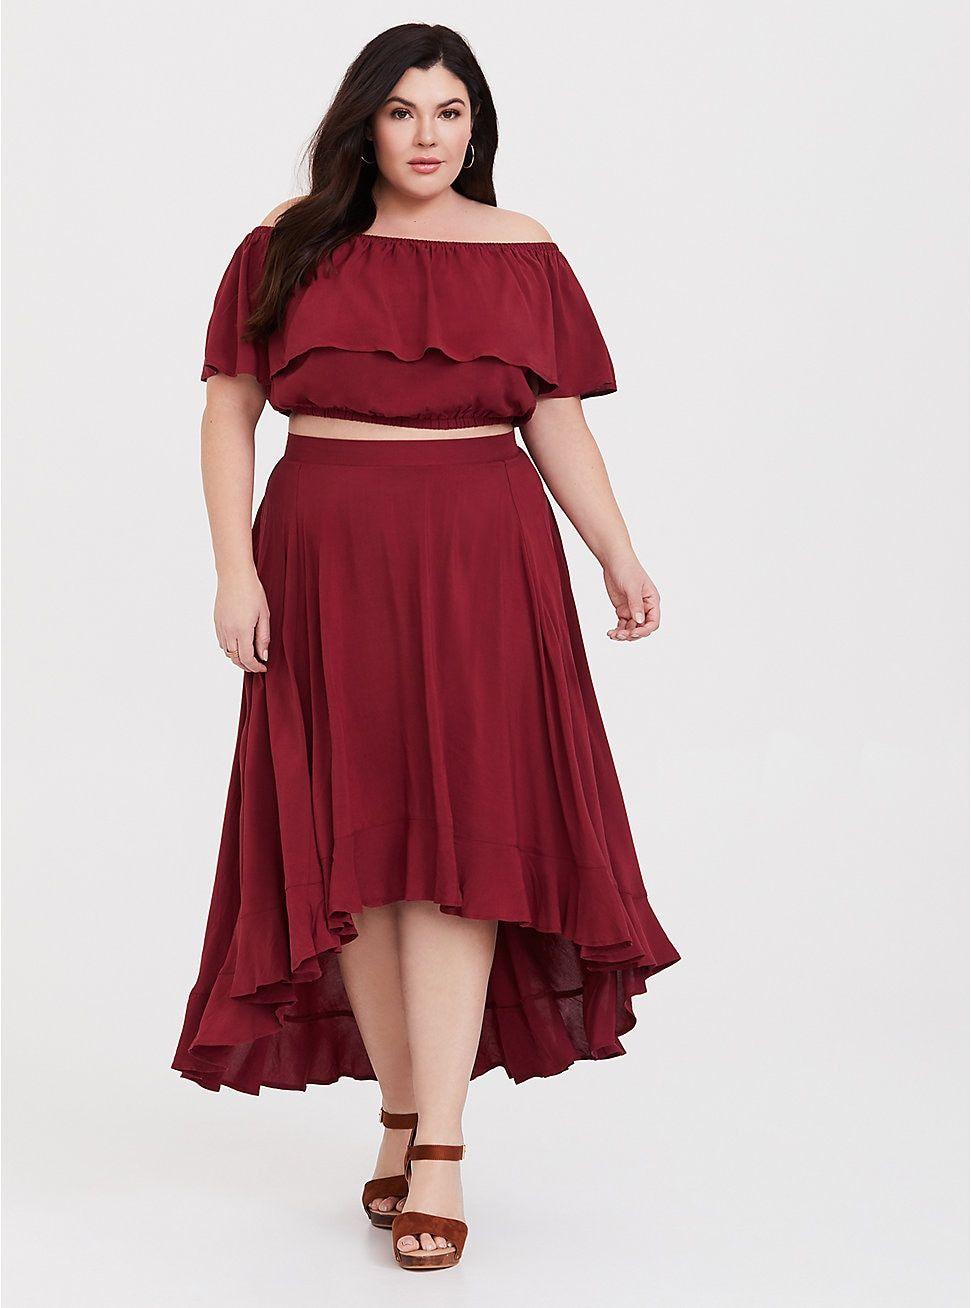 0b68d535bf Red Challis 2-Piece Set in 2019 | Just Dresses! | Dresses, Challis ...